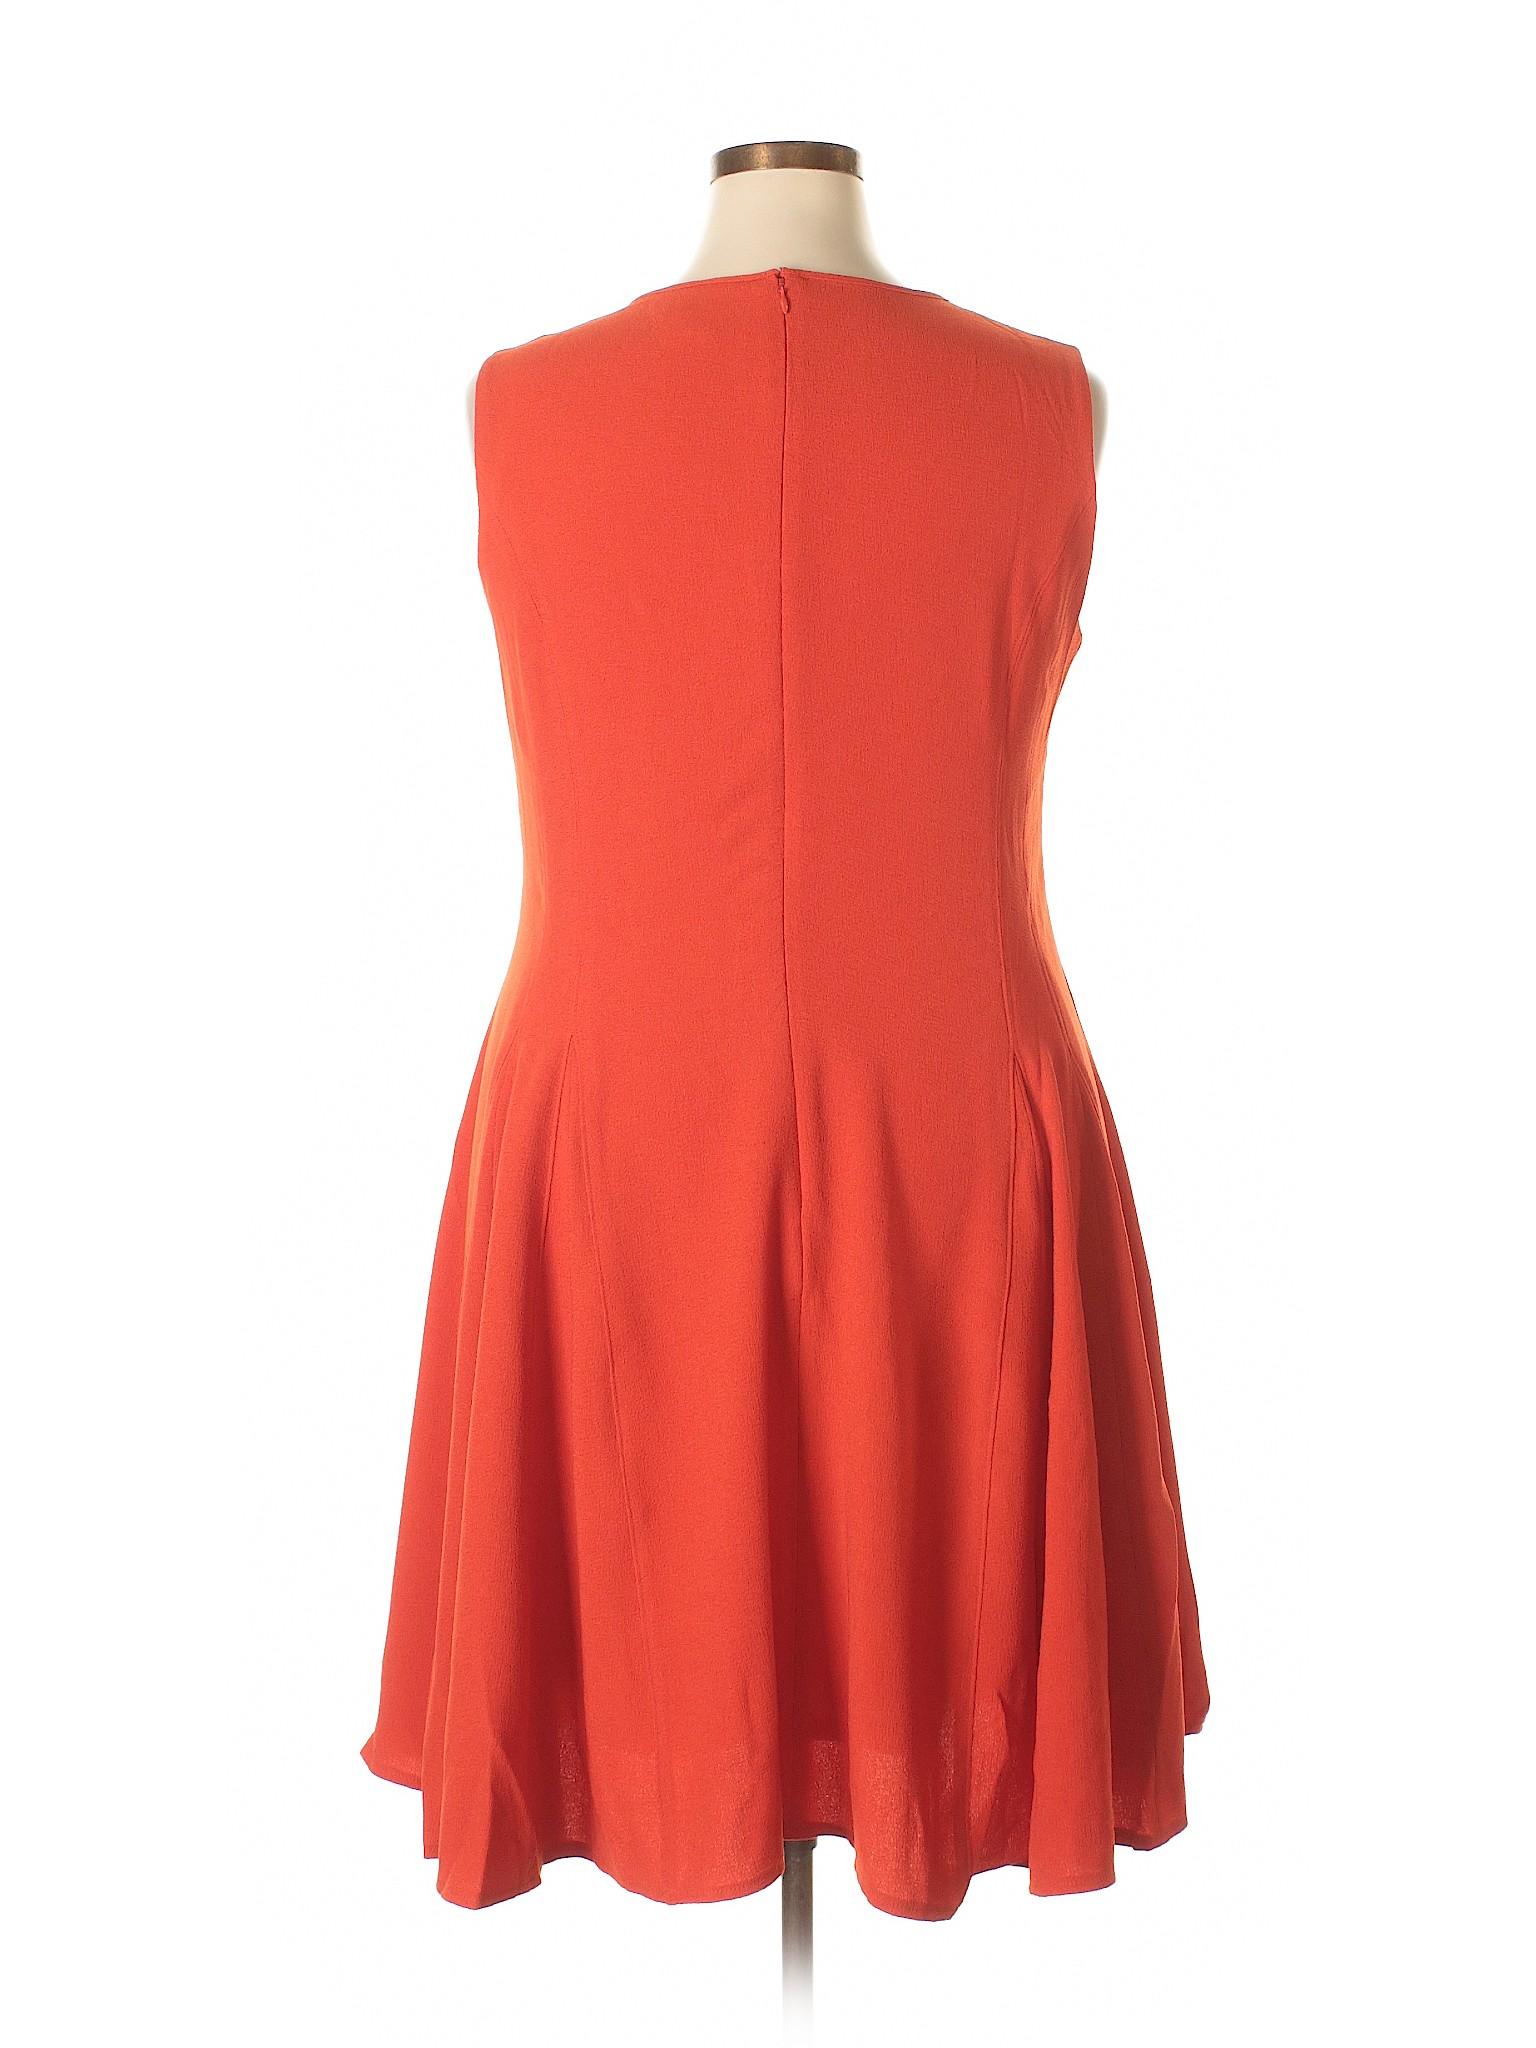 winter winter Boutique Casual Dress Boutique Boutique Casual Taylor Taylor winter Taylor Dress ZfqSwIxE7